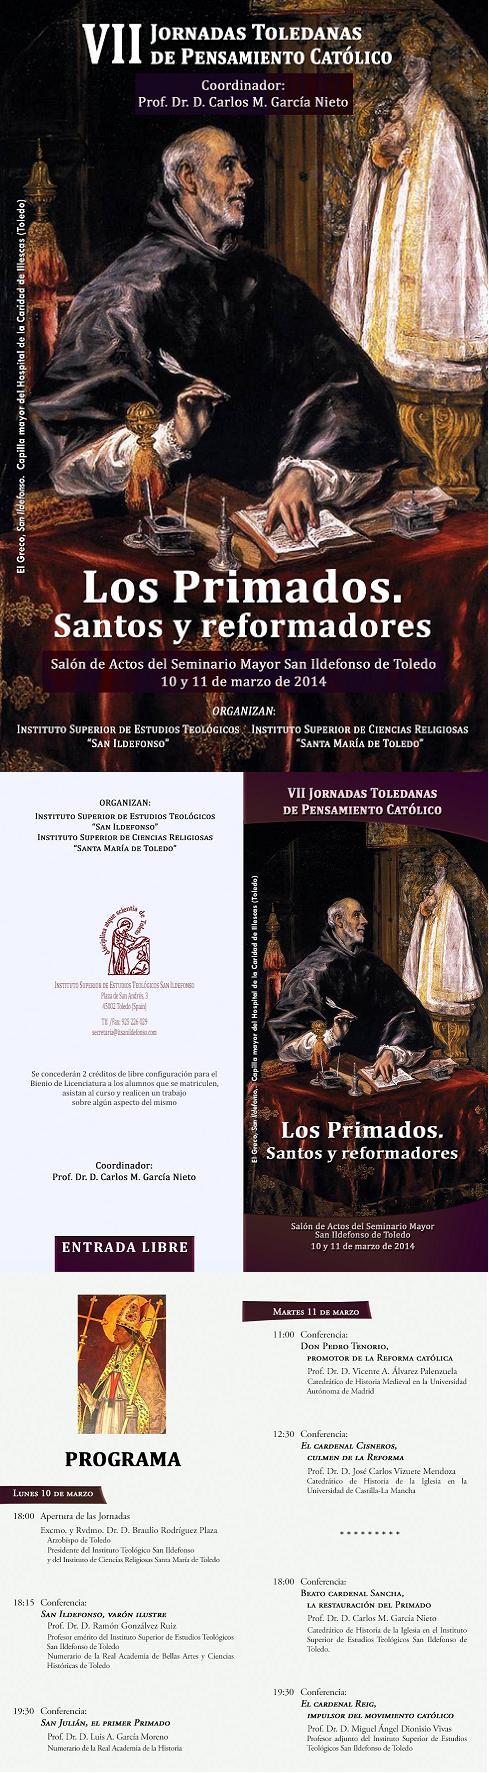 20140228233342-vii-jornadas-toledanas-de-pensamiento-catolico.jpg